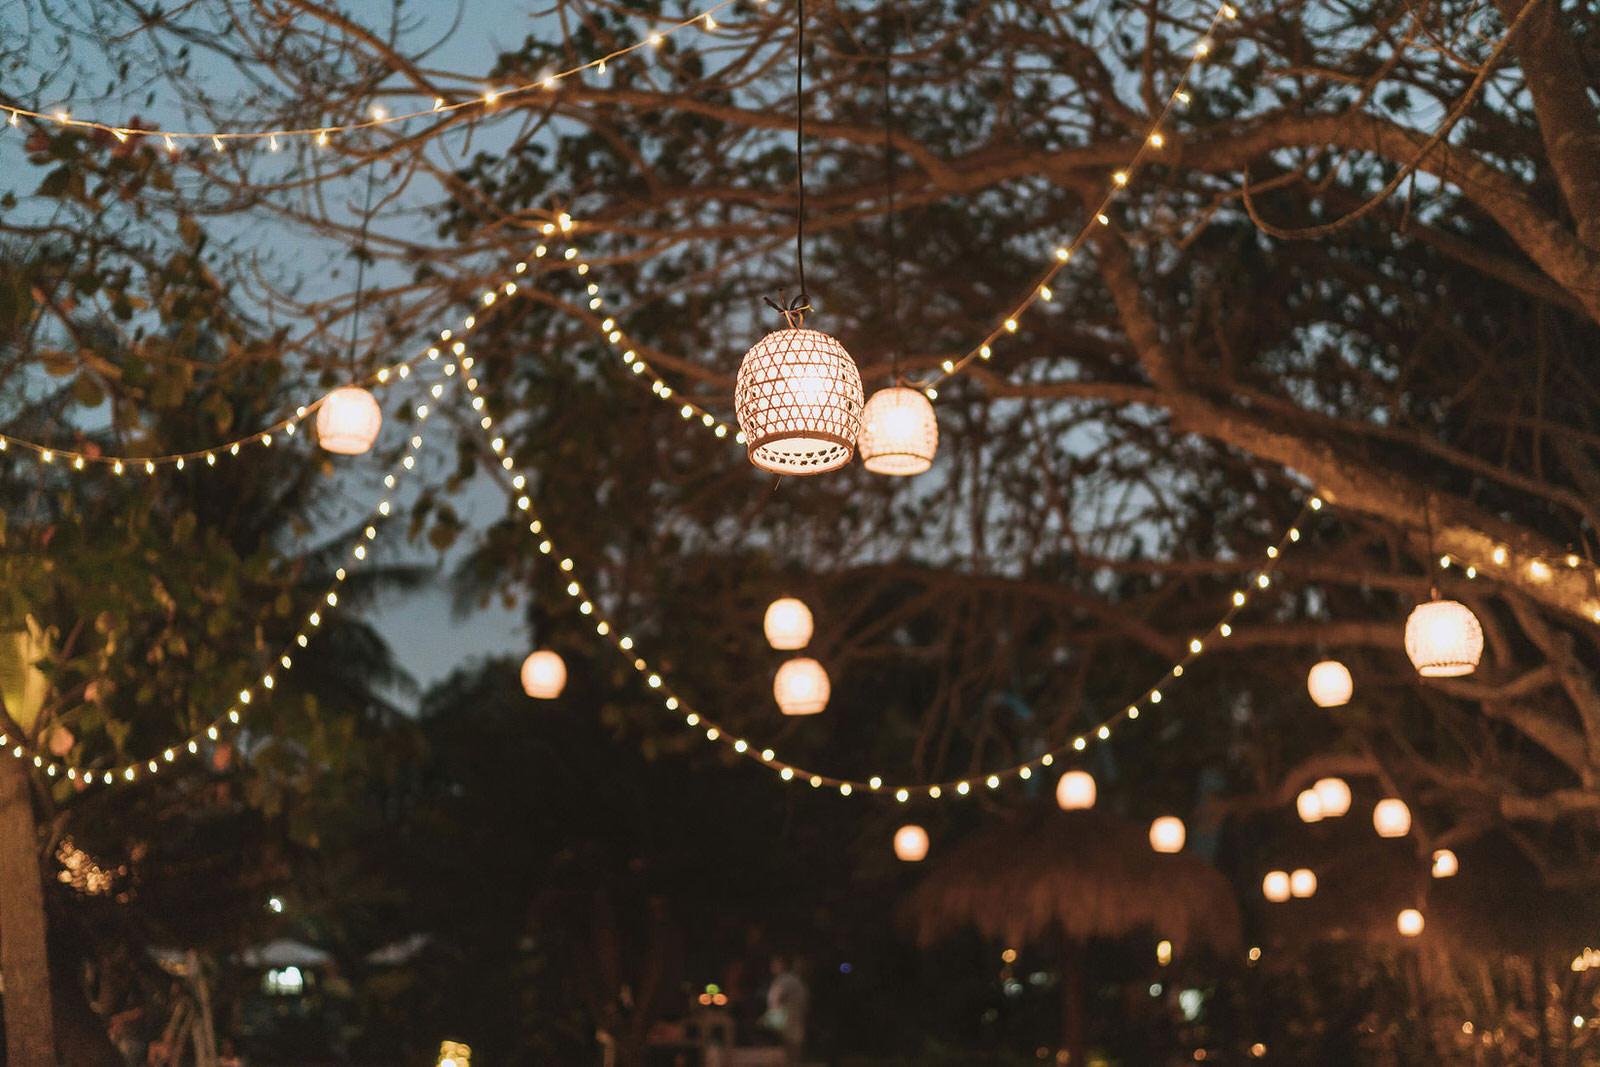 newfound-hai-tide-nusa-lembongan-bali-wedding-photographers-142